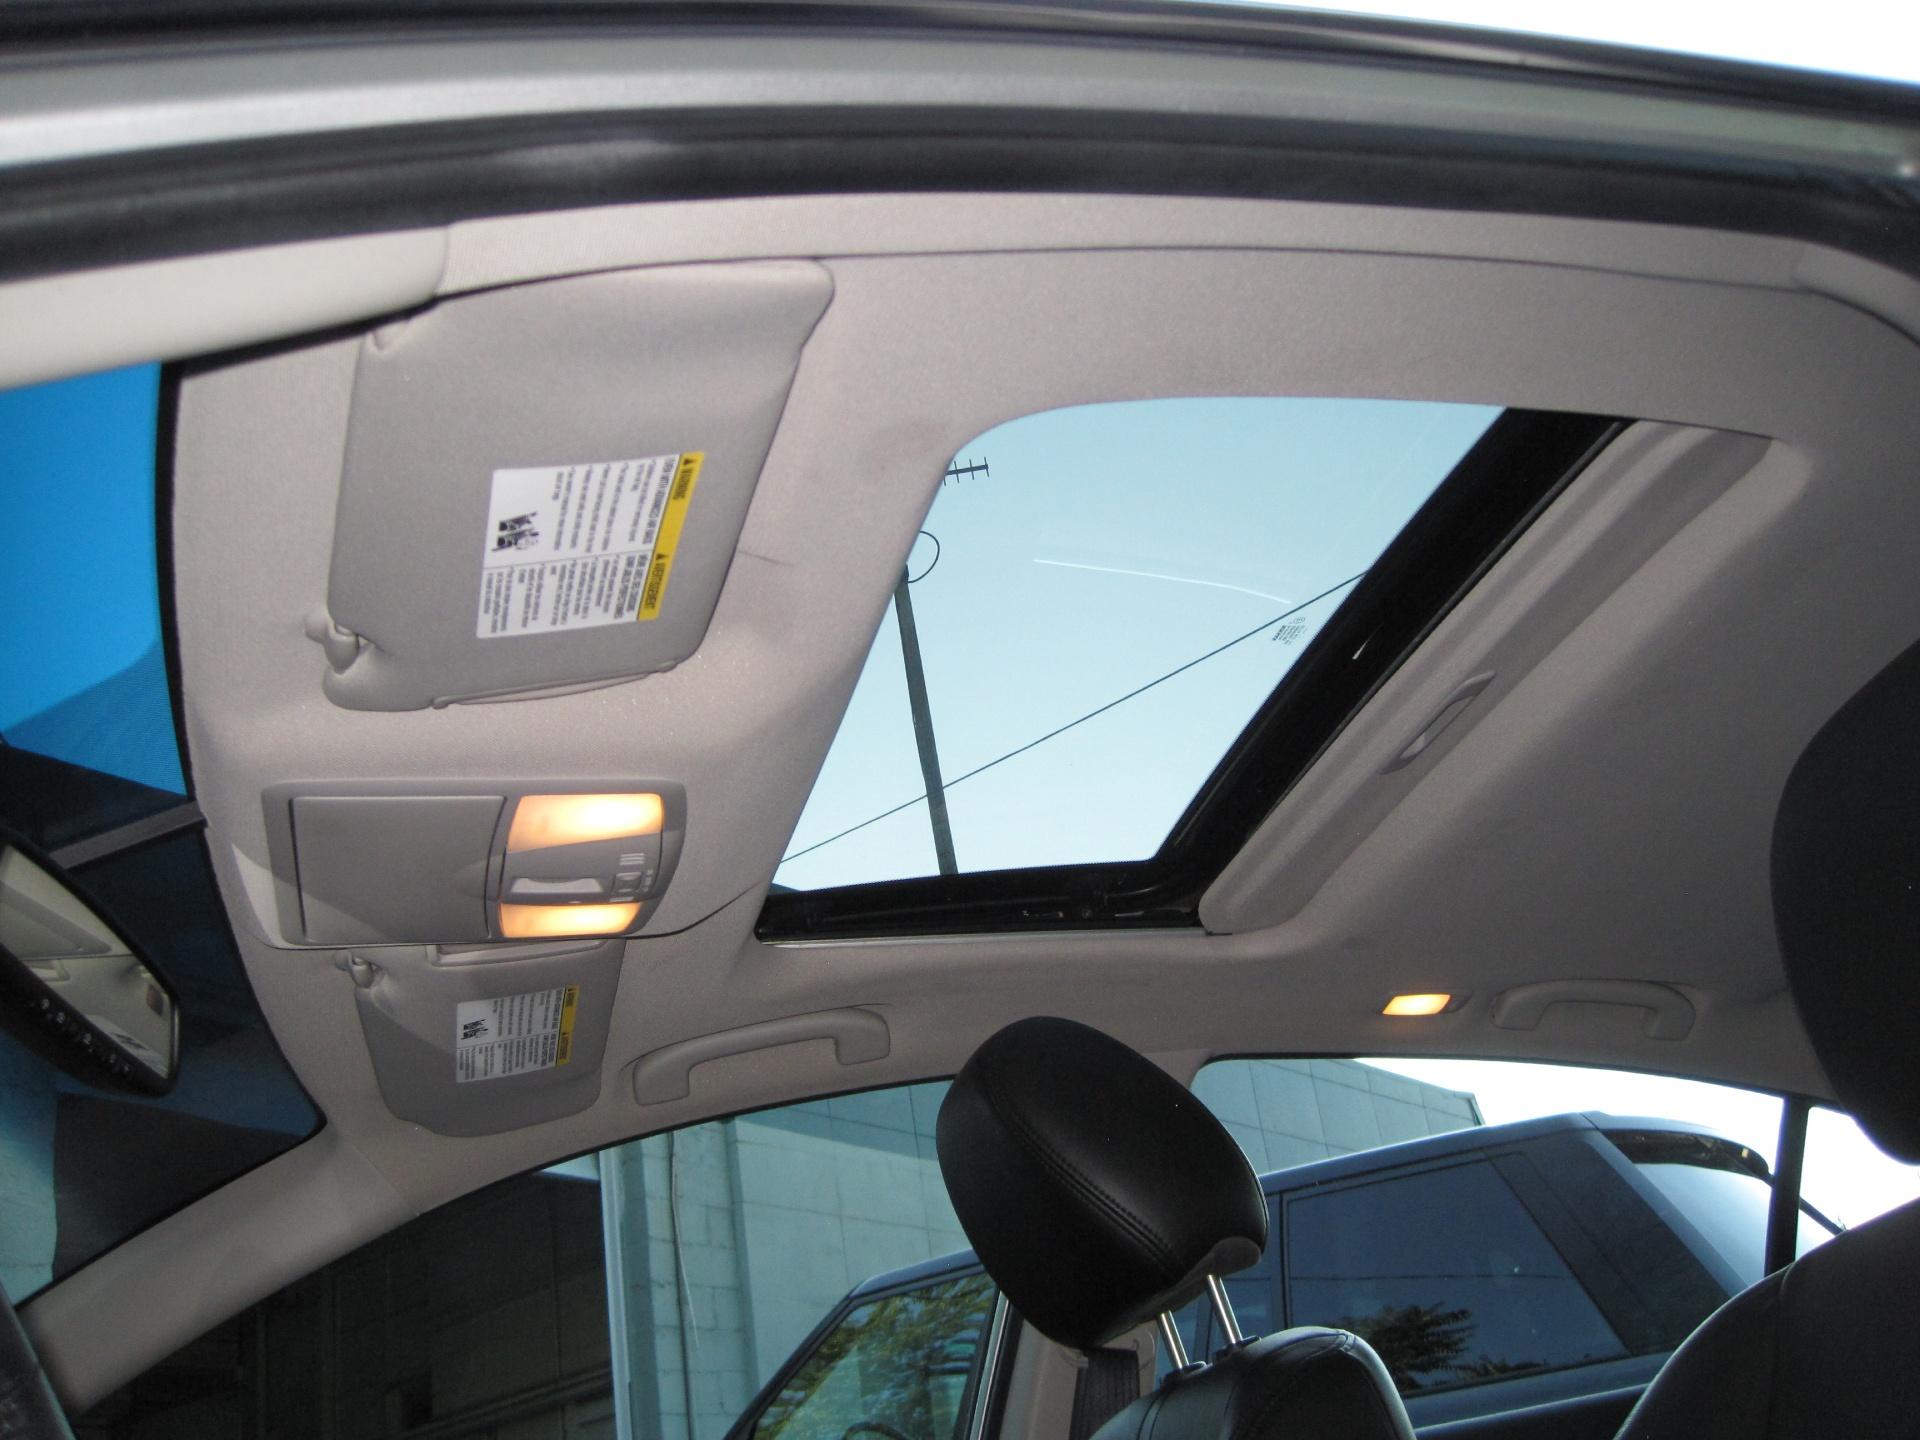 Nissan Altima: Moonroof